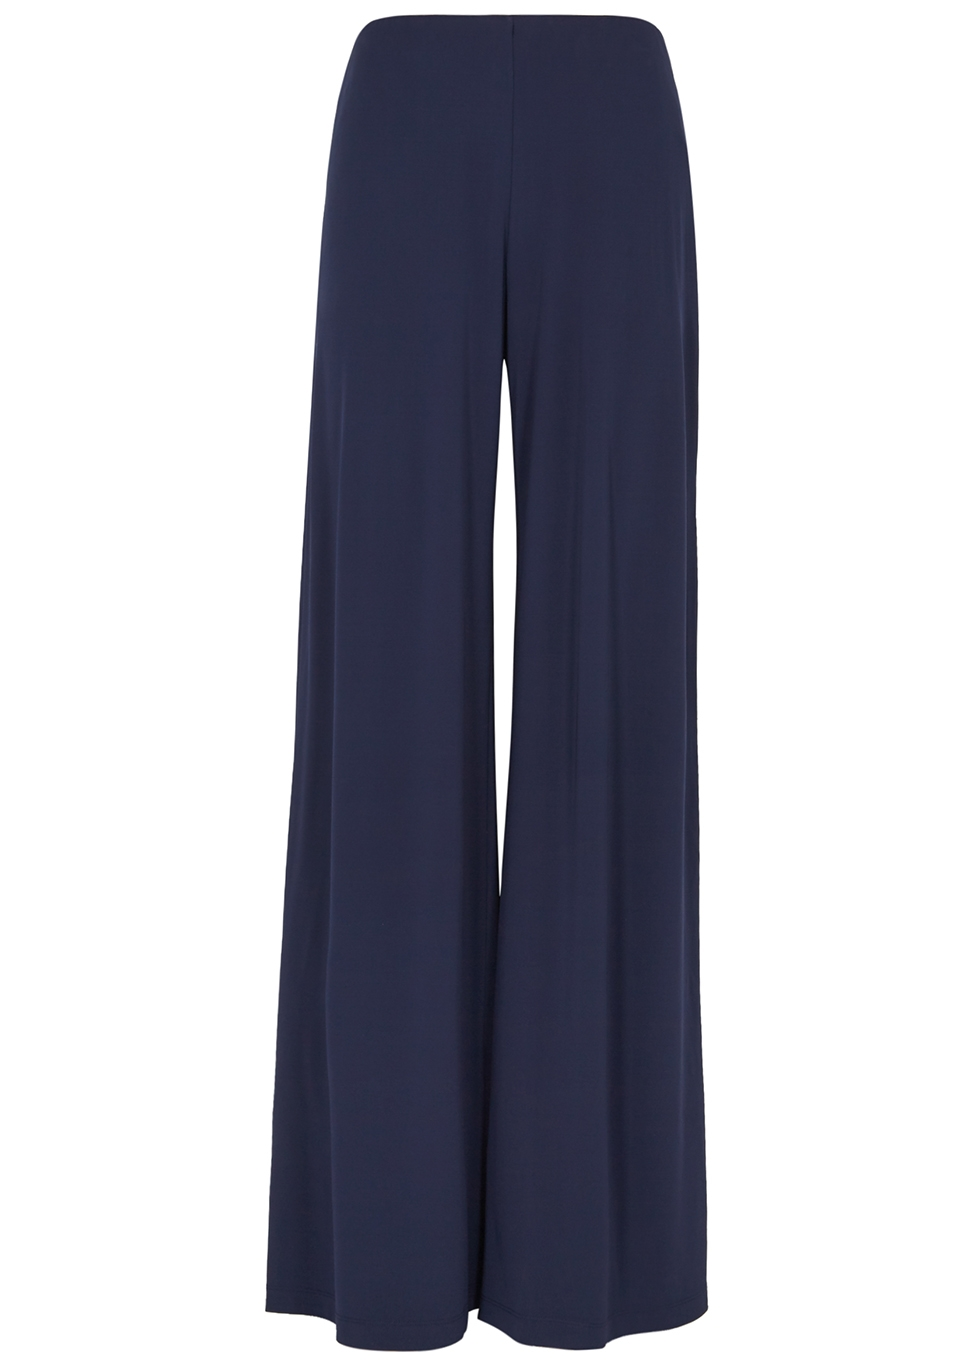 Navy wide-leg jersey trousers - M Missoni